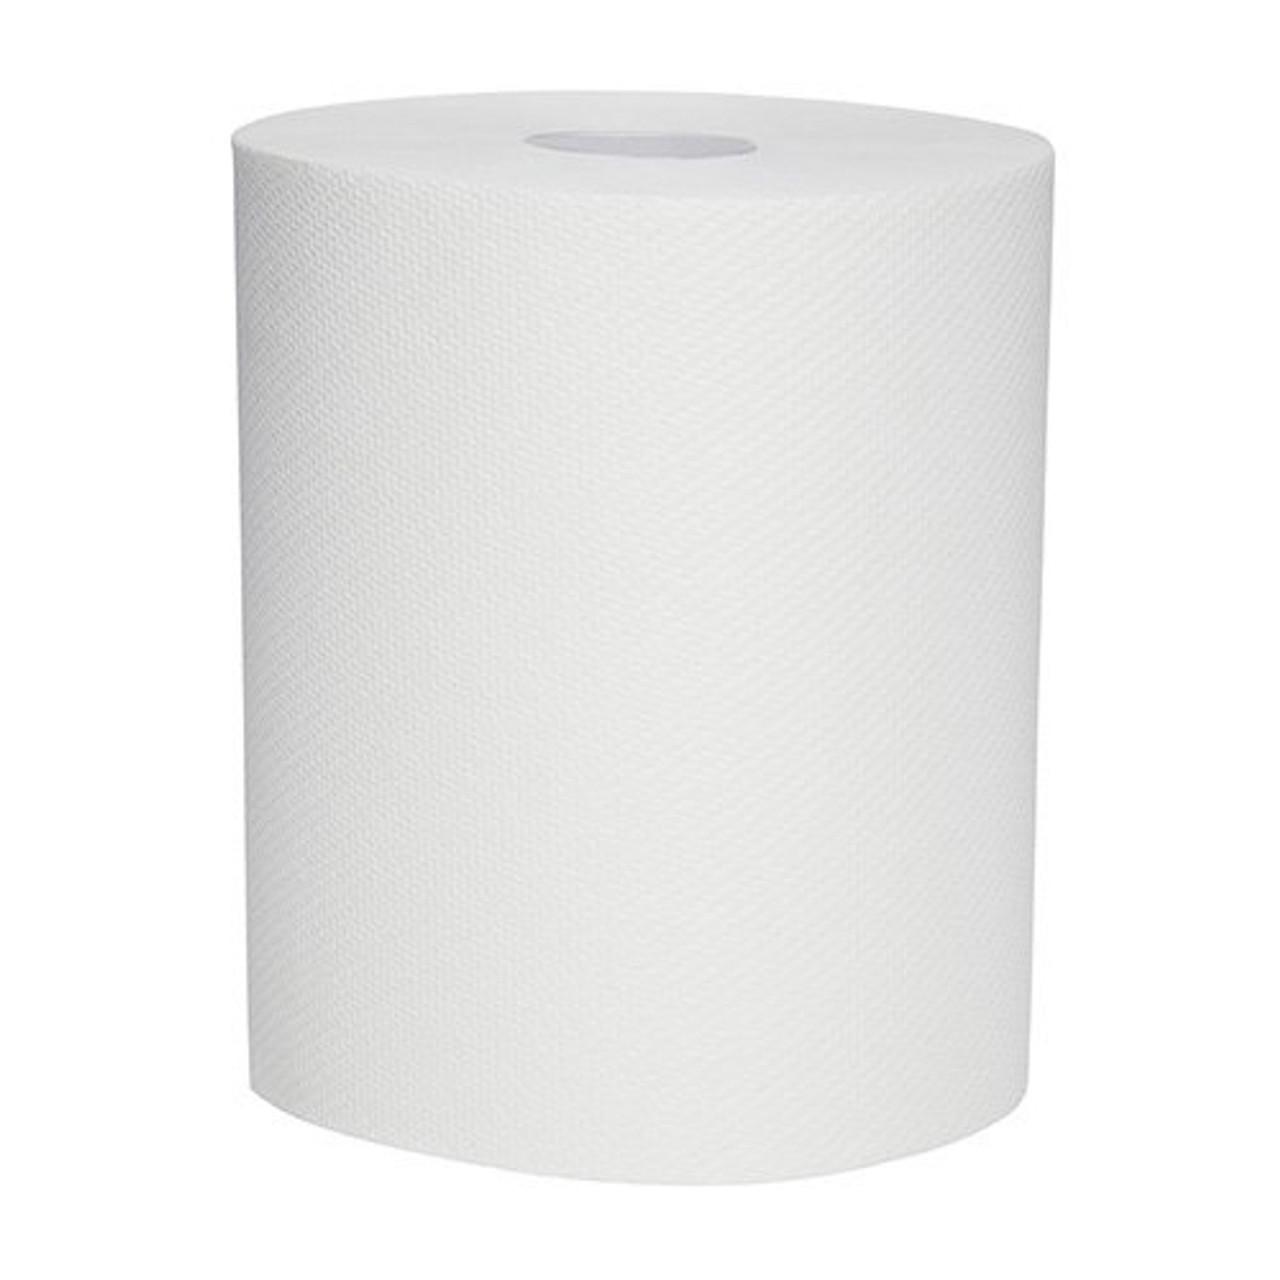 Kimberly Clark Scott Roll Towel 100 Metres x 6 Rolls (KC 4419) Kimberly Clark Professional